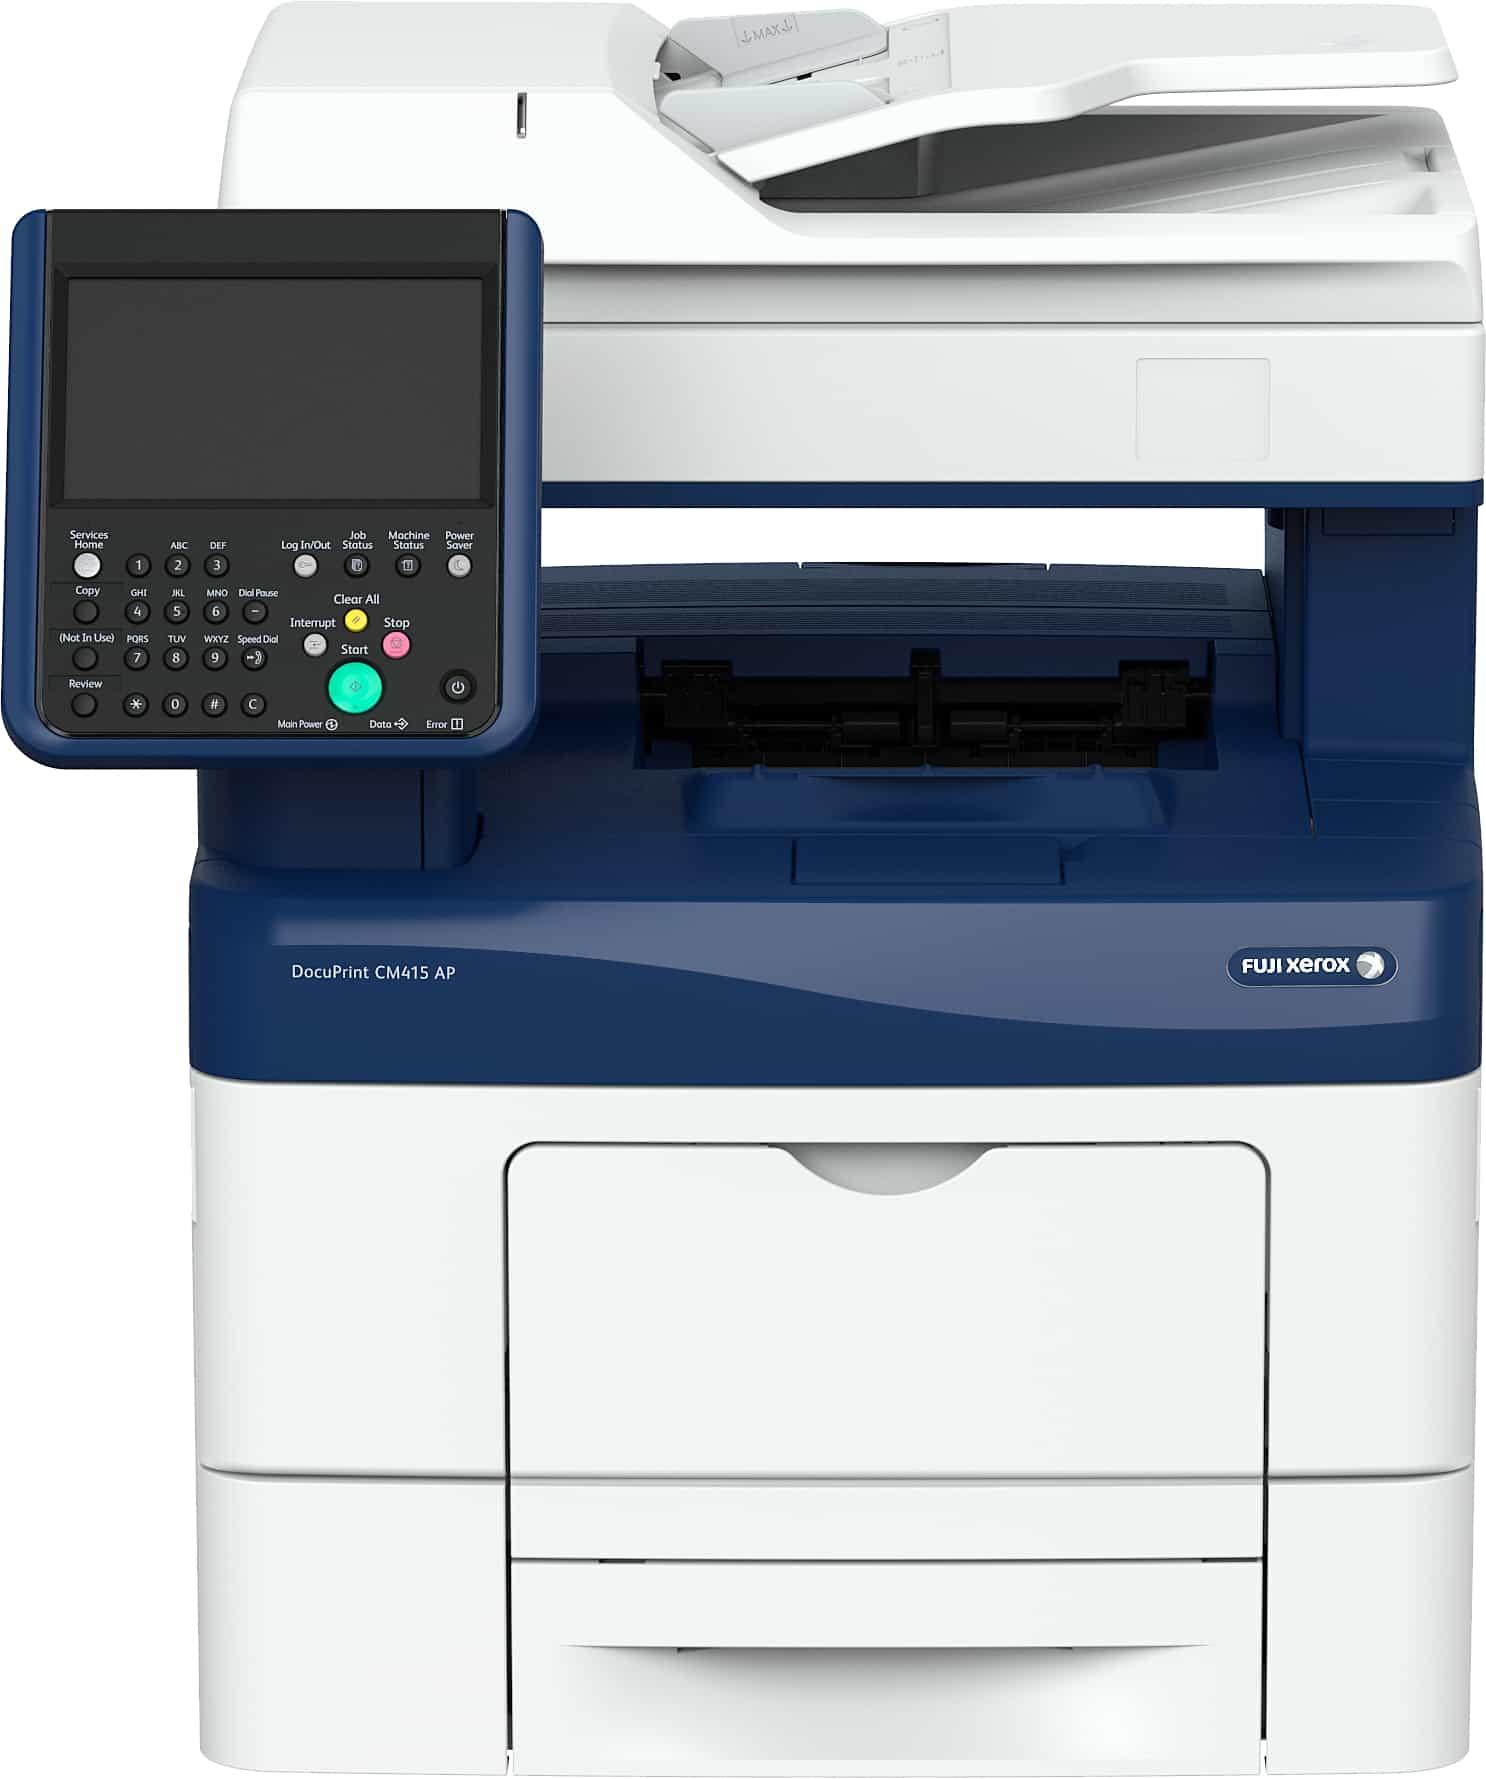 Fuji Xerox Color Laser Mfp Dpcm415ap Lps Malaysia Office Printers